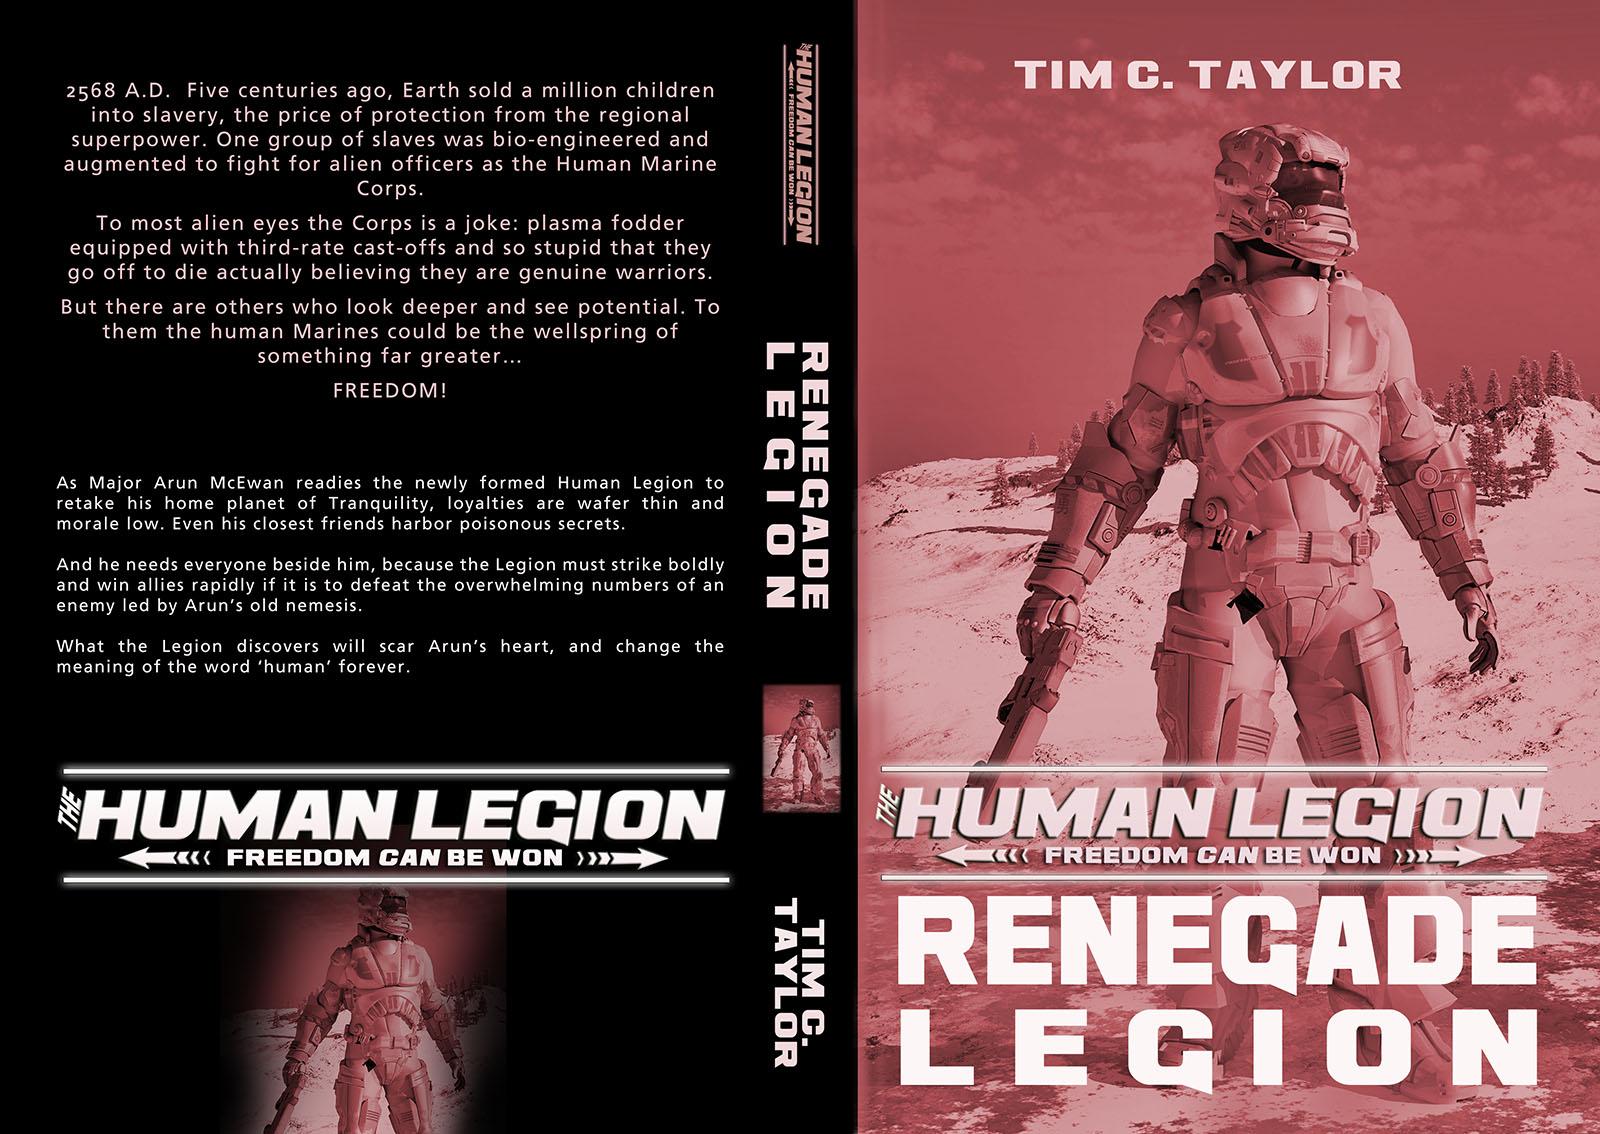 RenegadeLegion_Paperback_03LuLu_flat_small